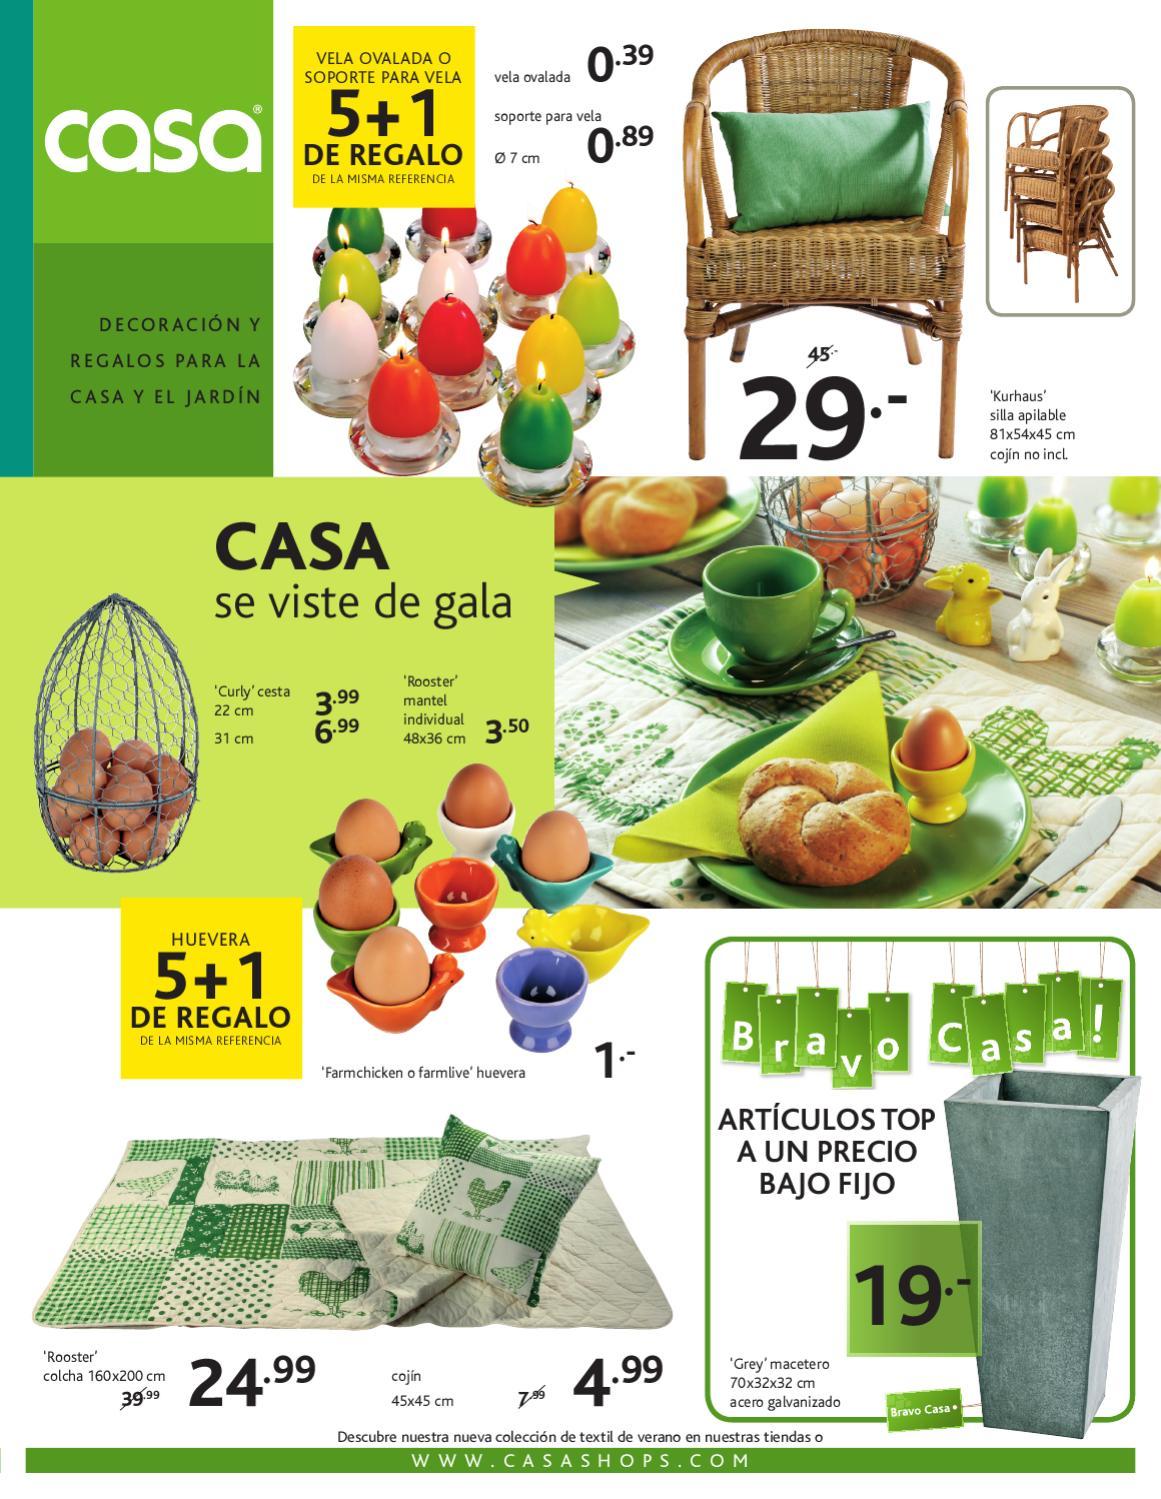 Cat logo casashops decoraci n primavera 2012 by - Casashops catalogo ...